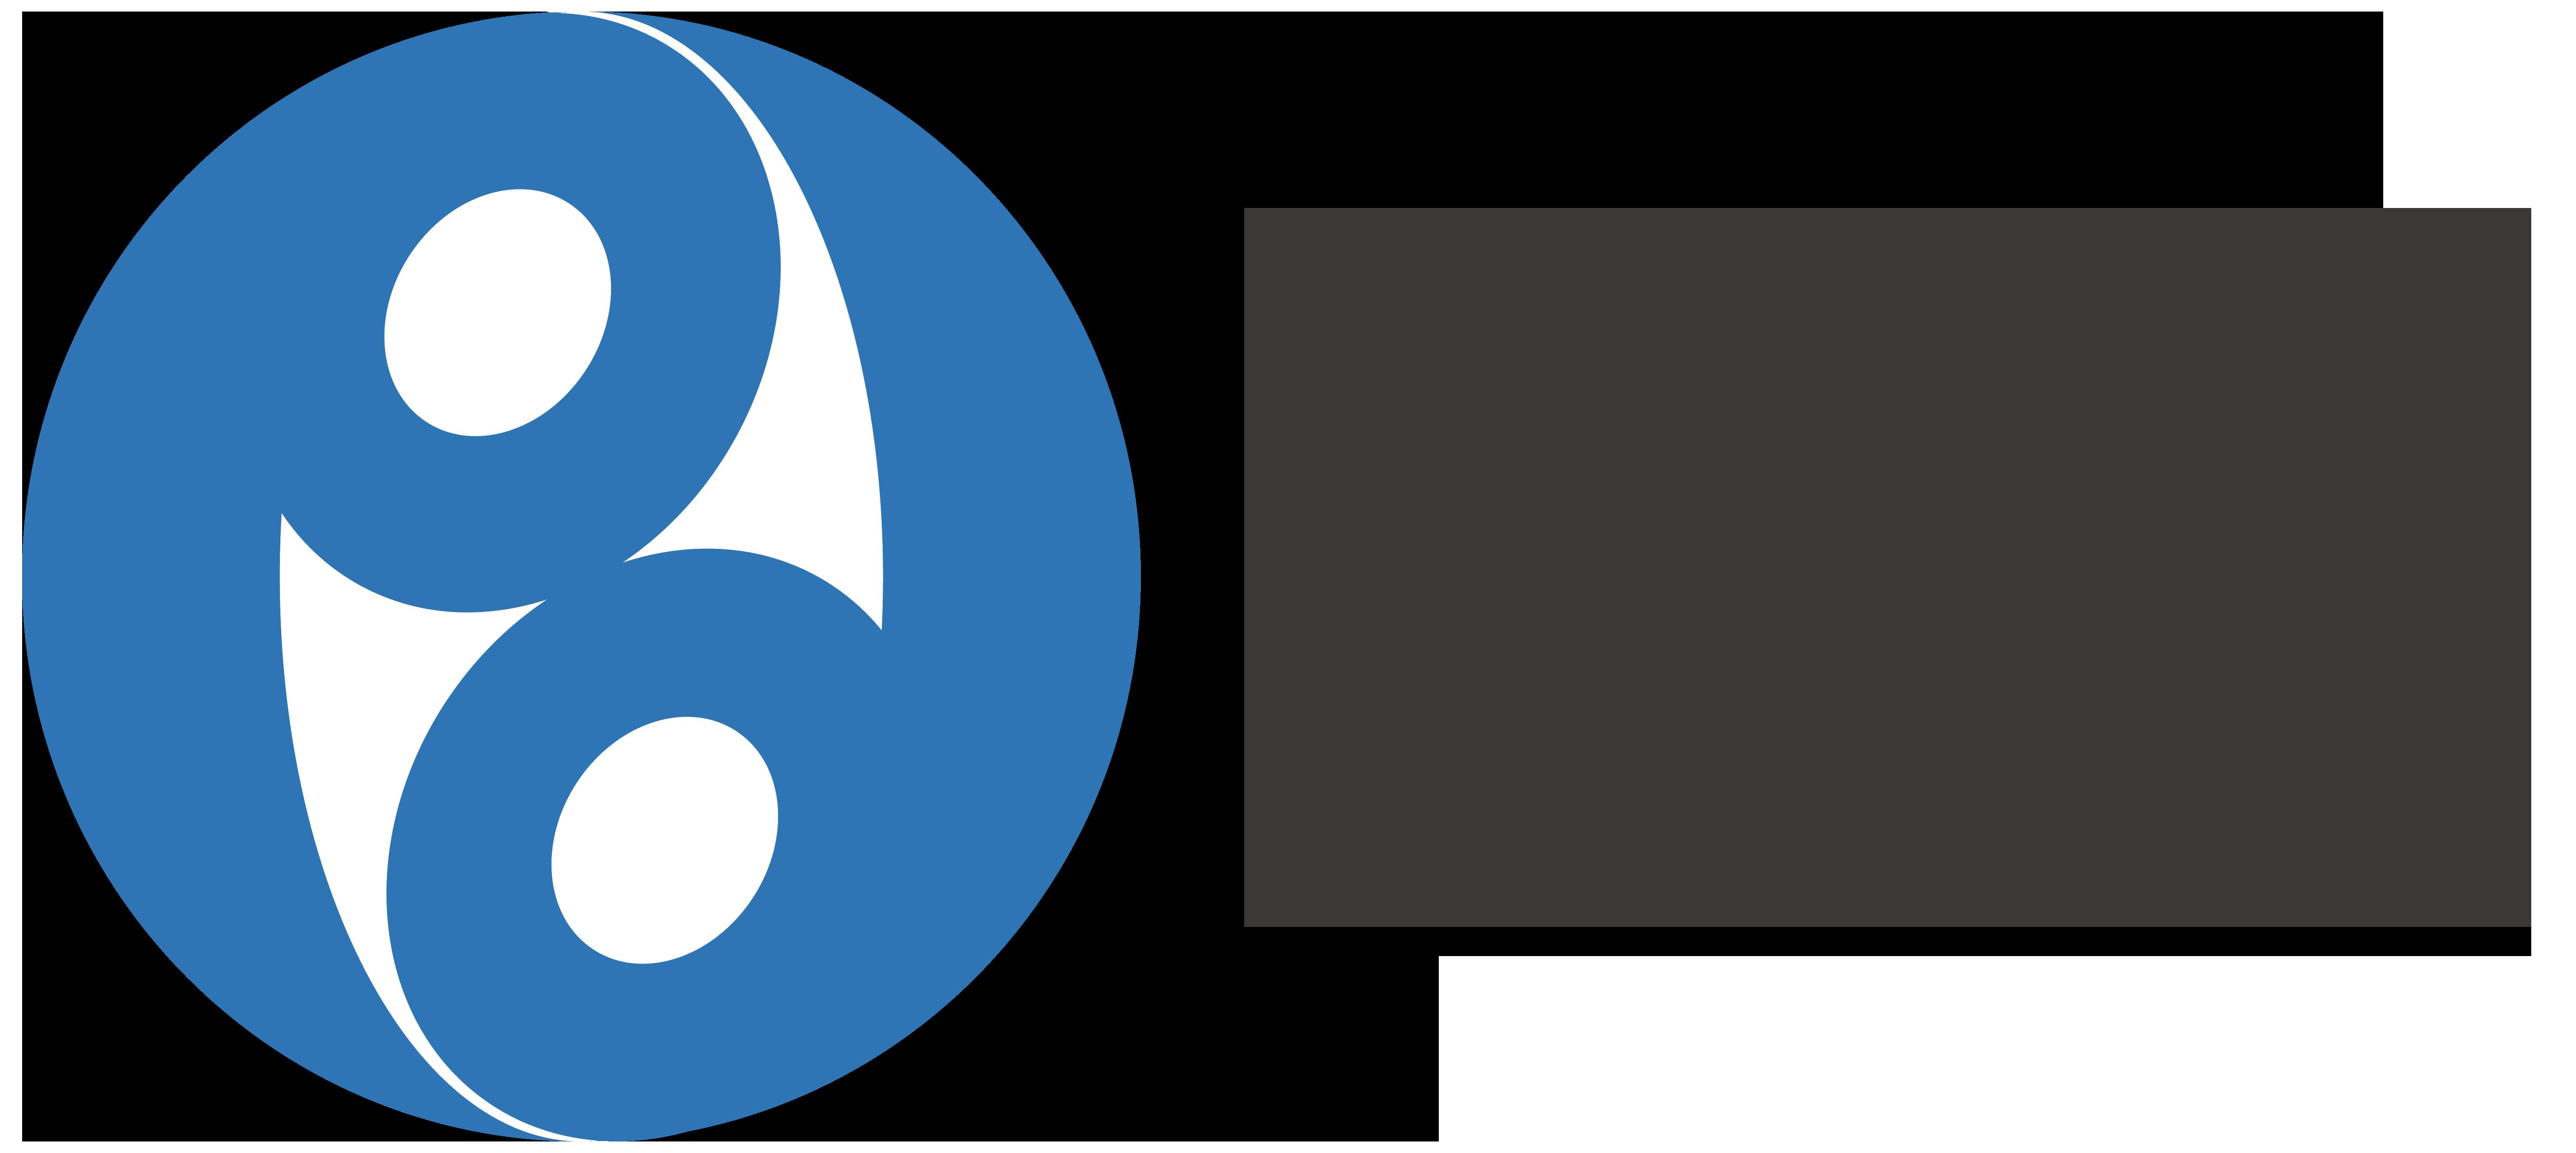 üzleti mentor logo